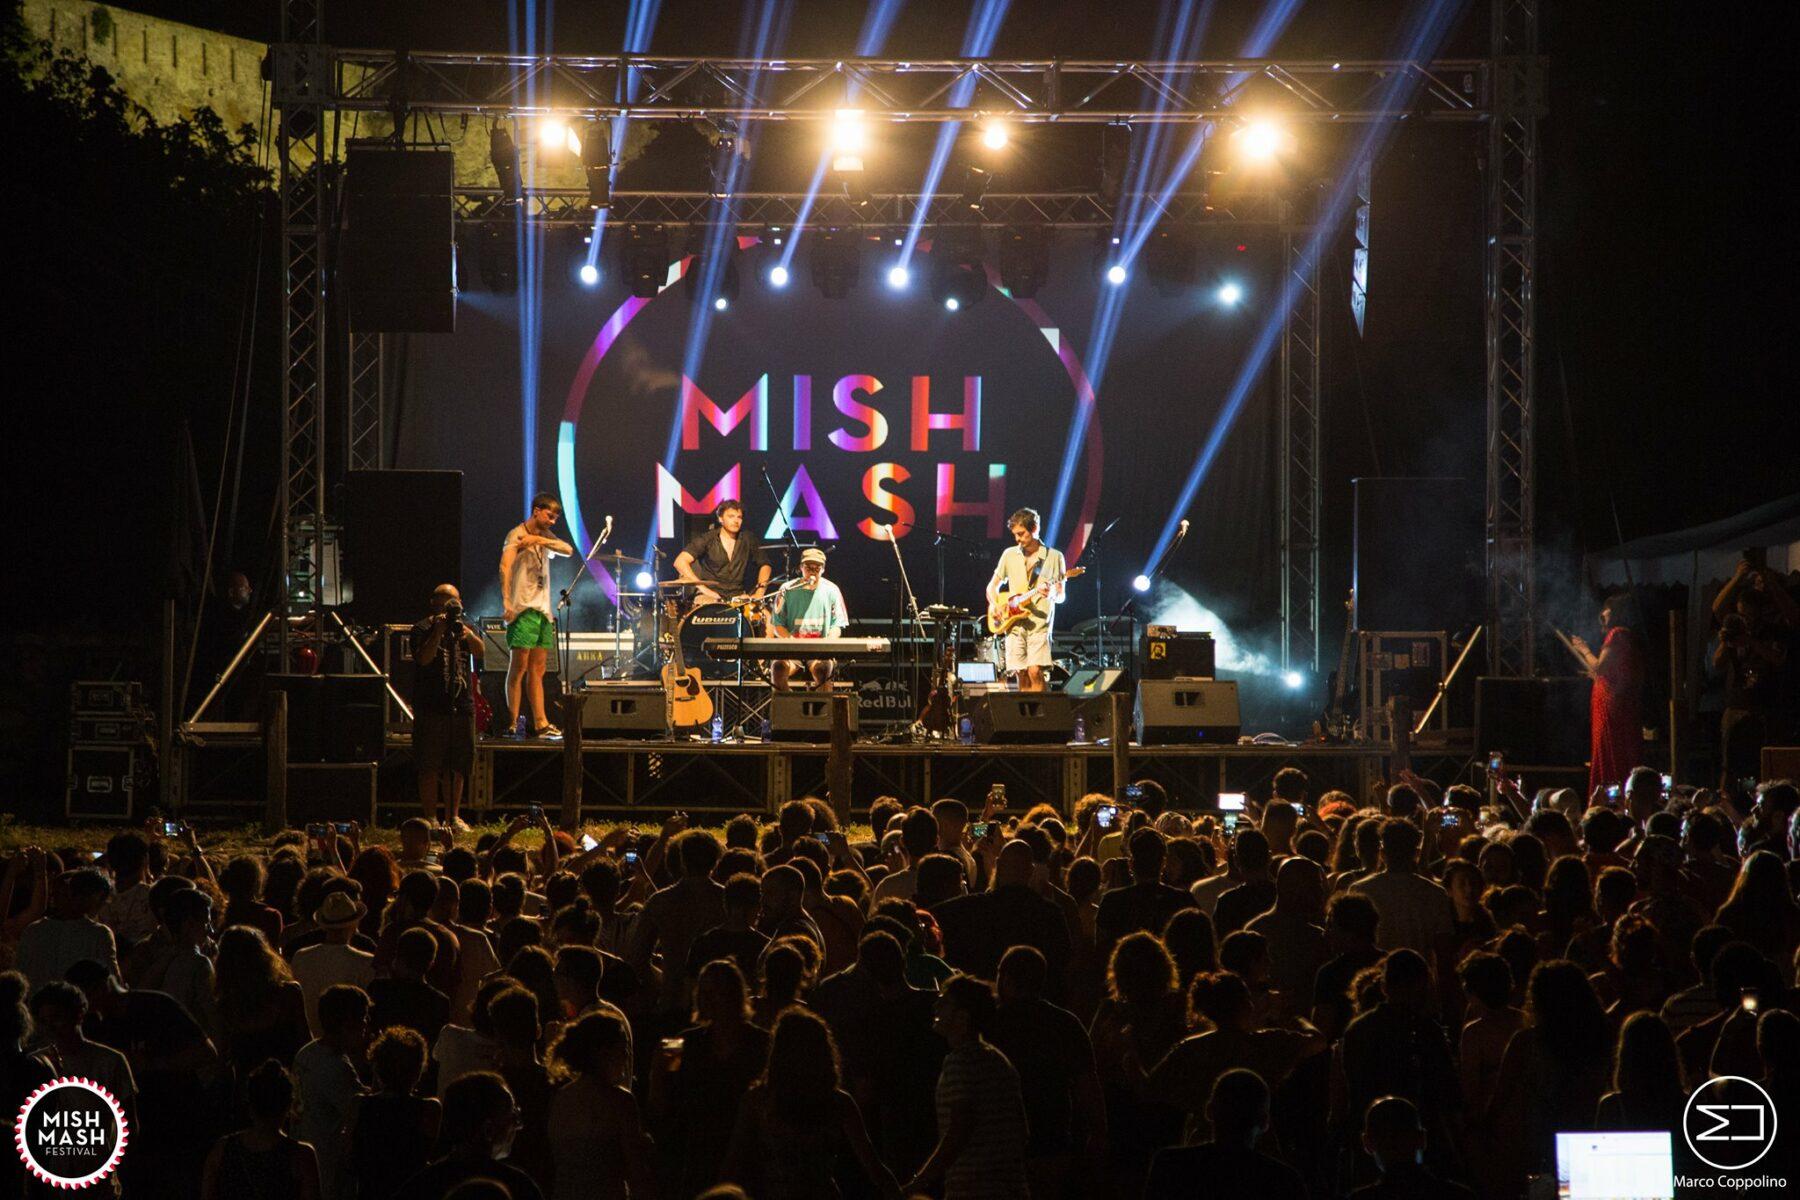 misi-mash-2018